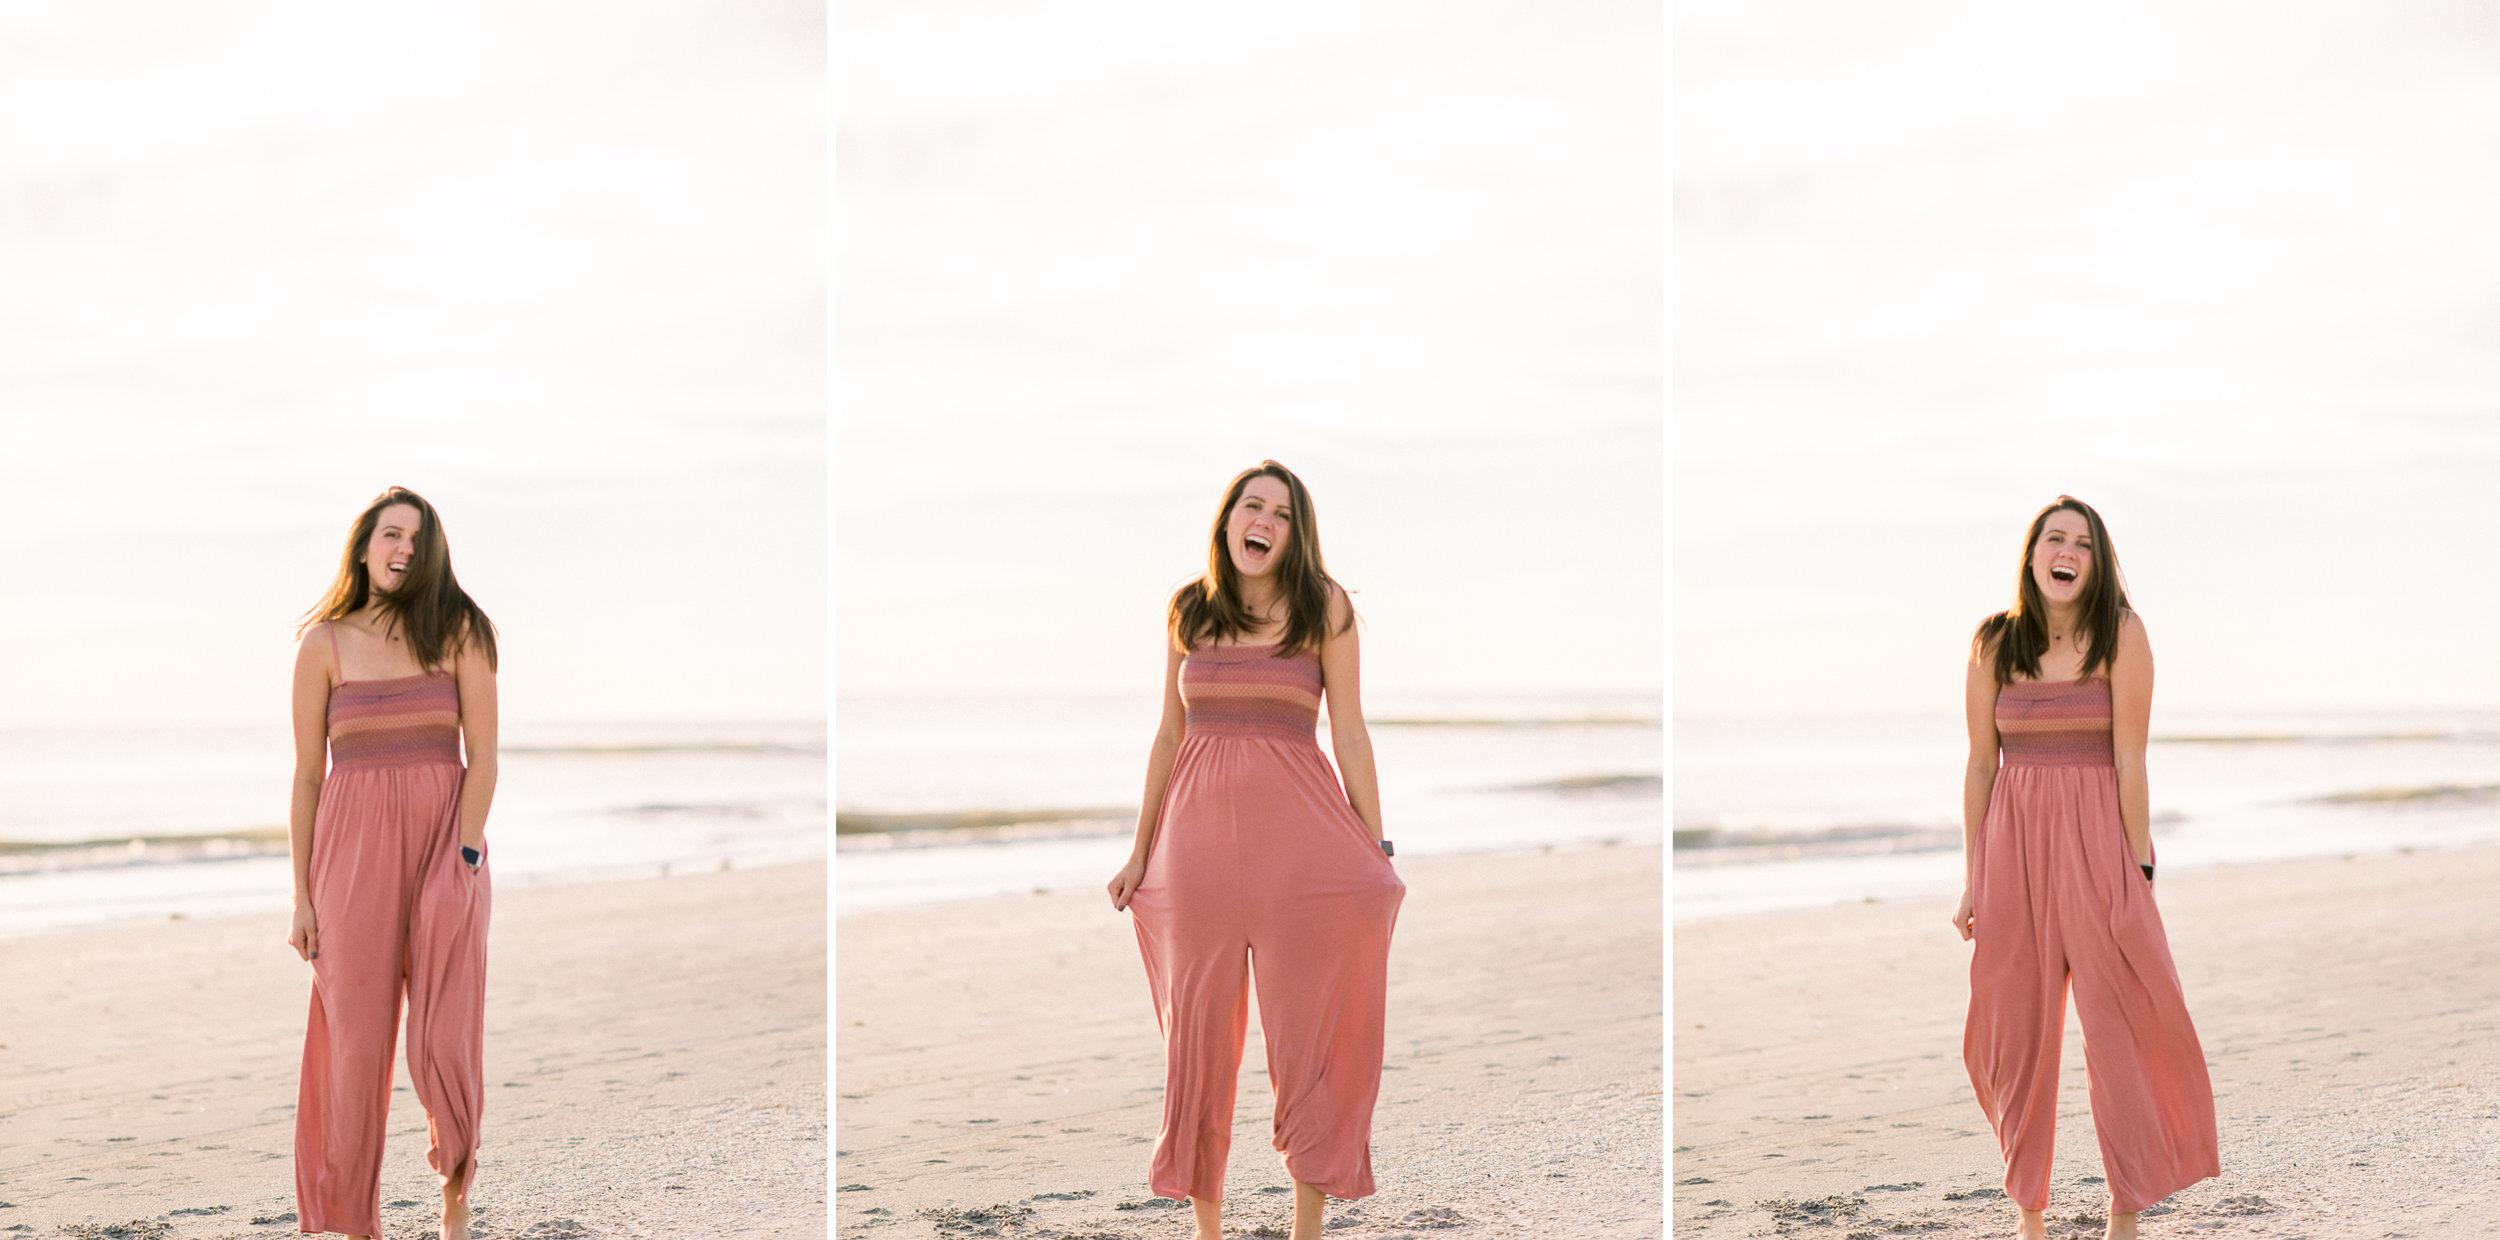 KateTaramykinStudios-Tampa-Senior-Portraits-Cameron-20.jpg